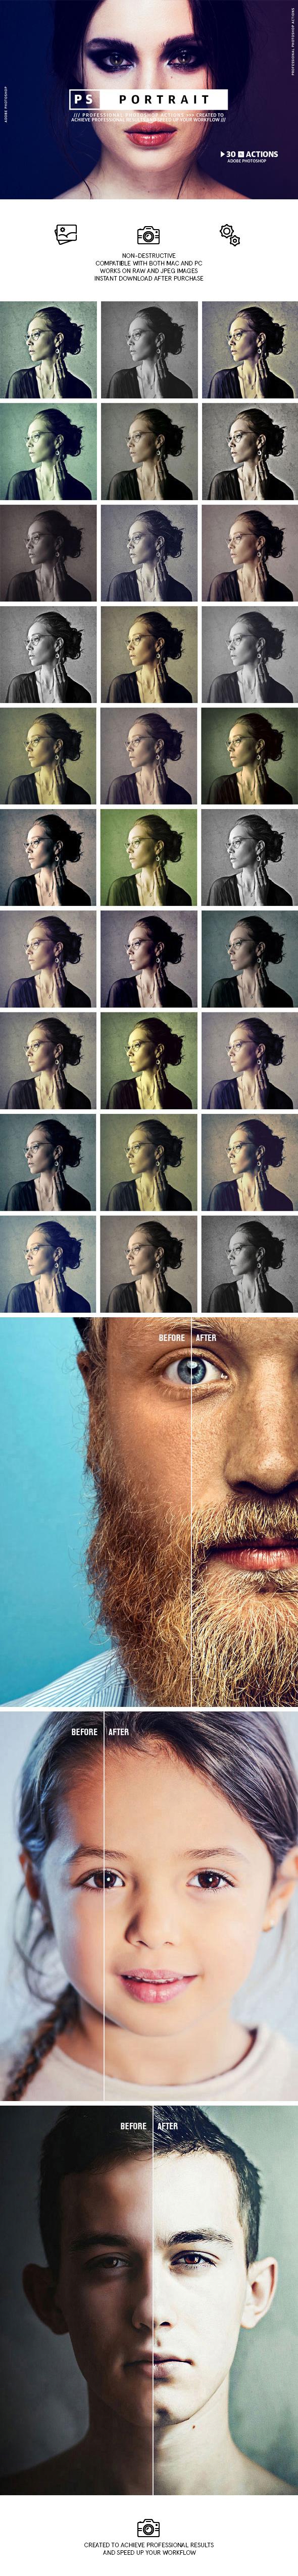 Portrait - Photoshop Actions - Photo Effects Actions